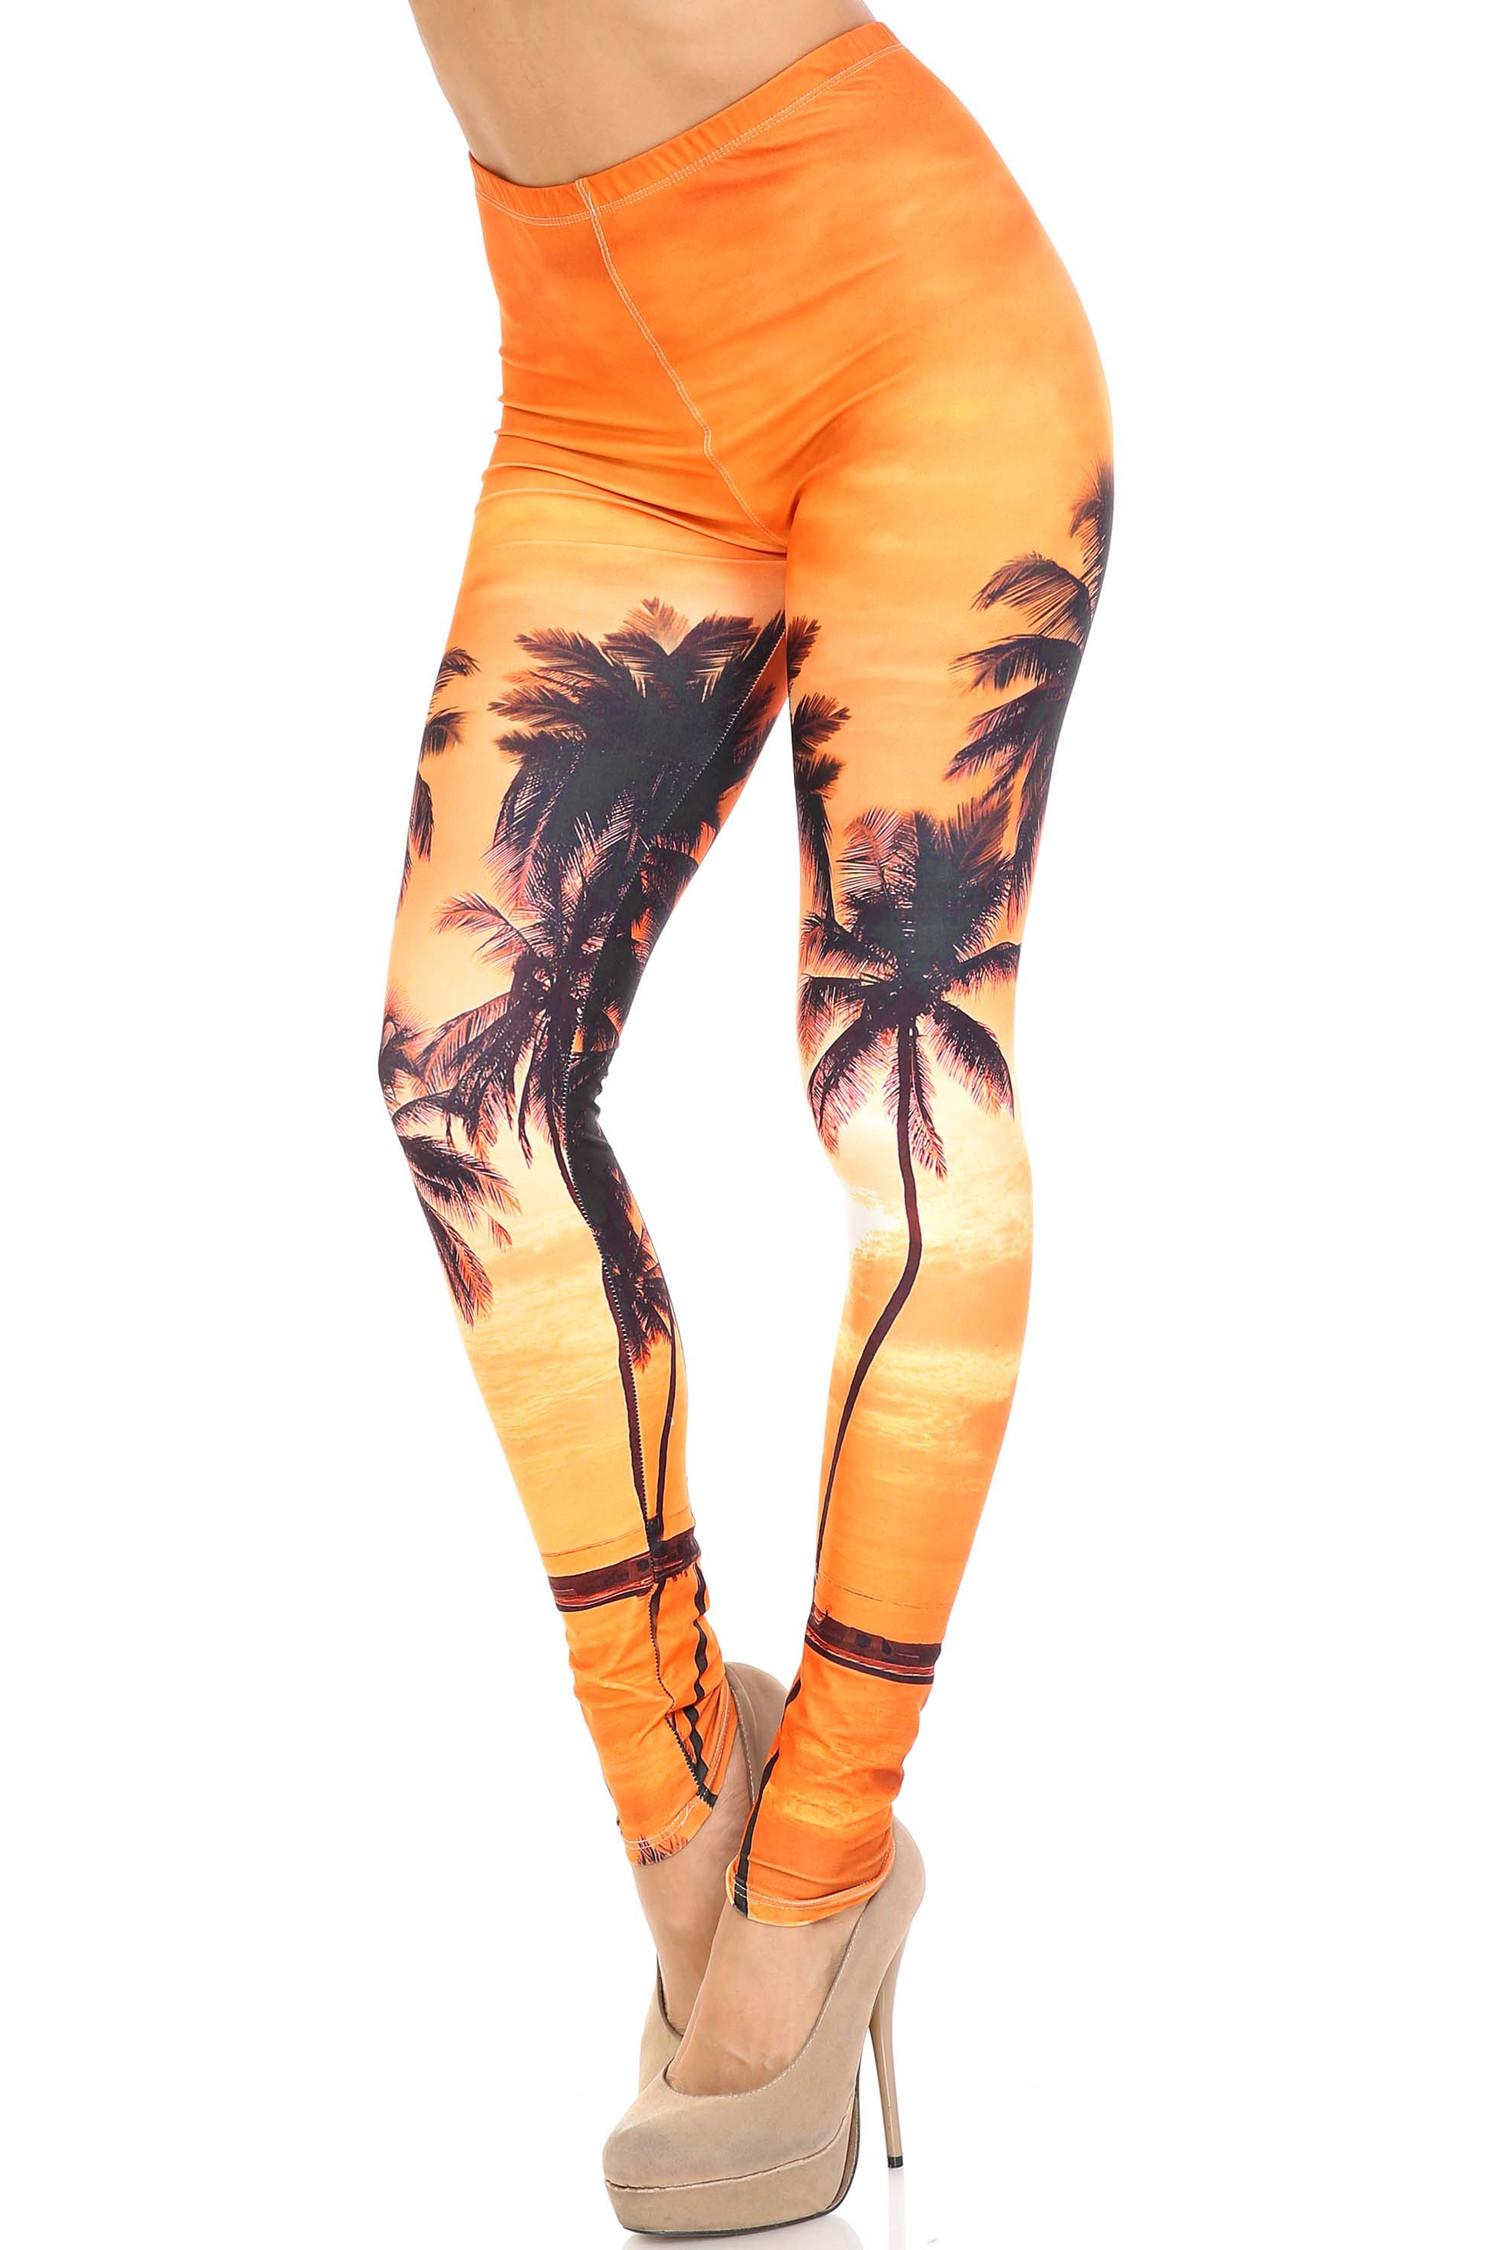 Creamy Soft Sunset Palm Plus Size Leggings - USA Fashion™